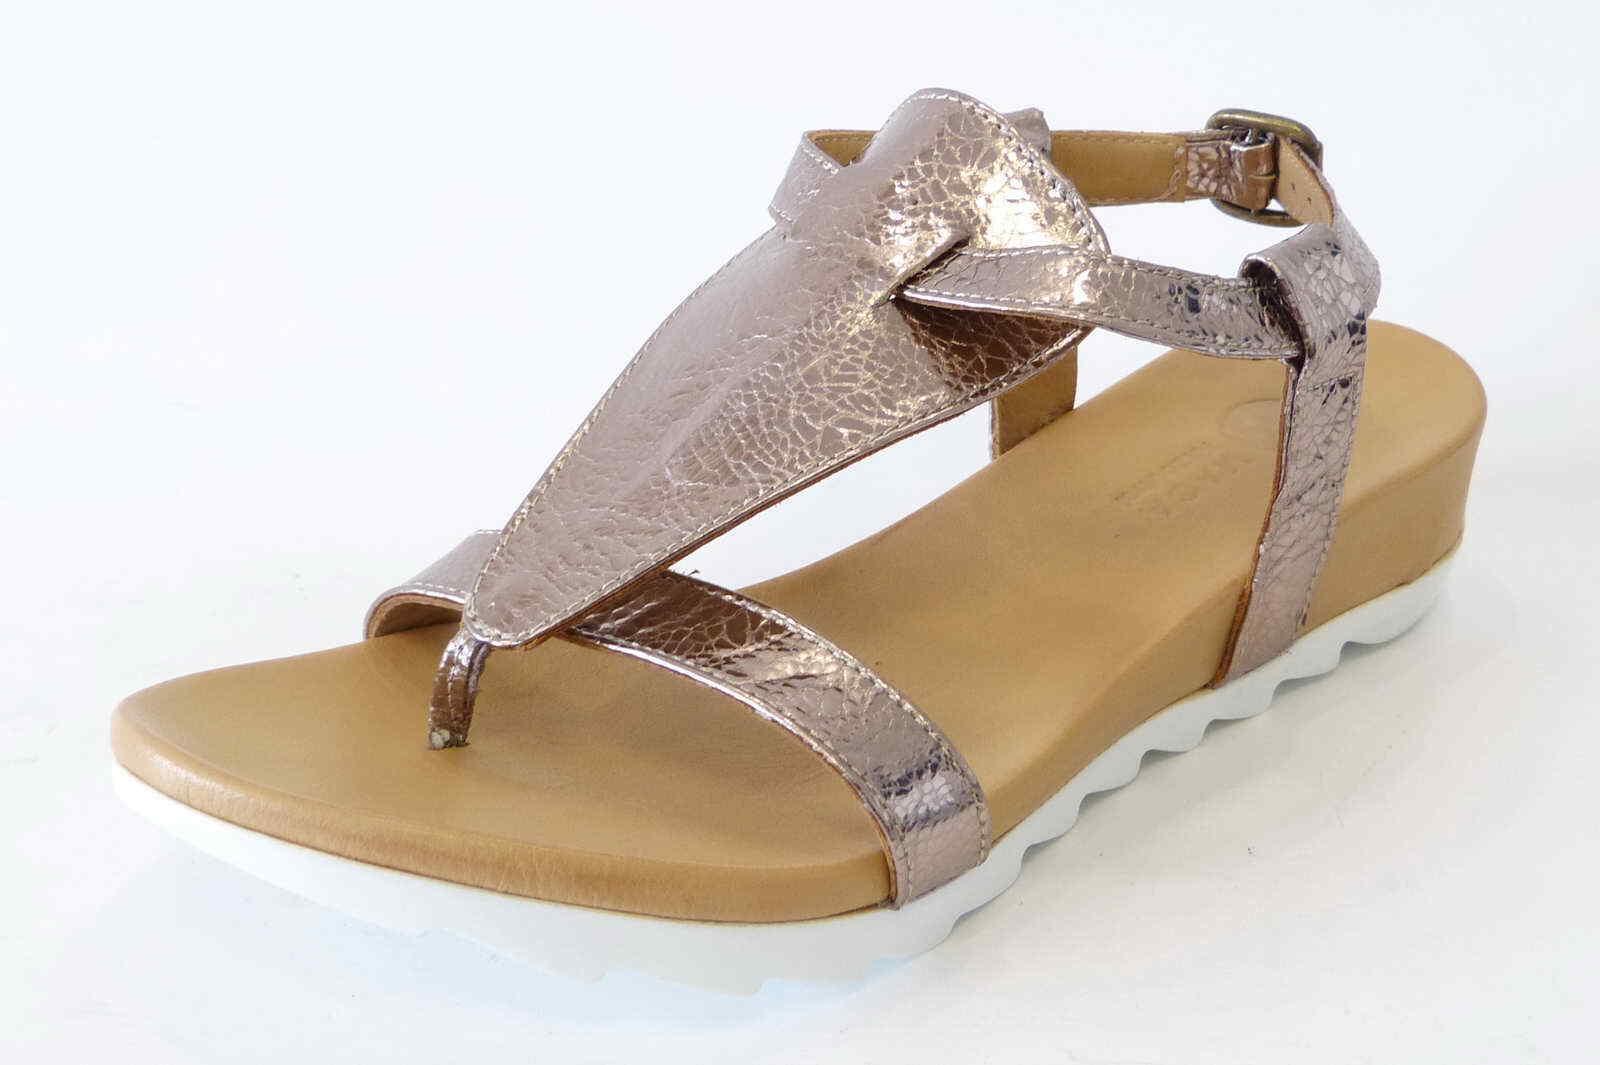 Maca Kitzbühel Zehentrenner Sandale 2213 moutongold metallic Dianette Leder